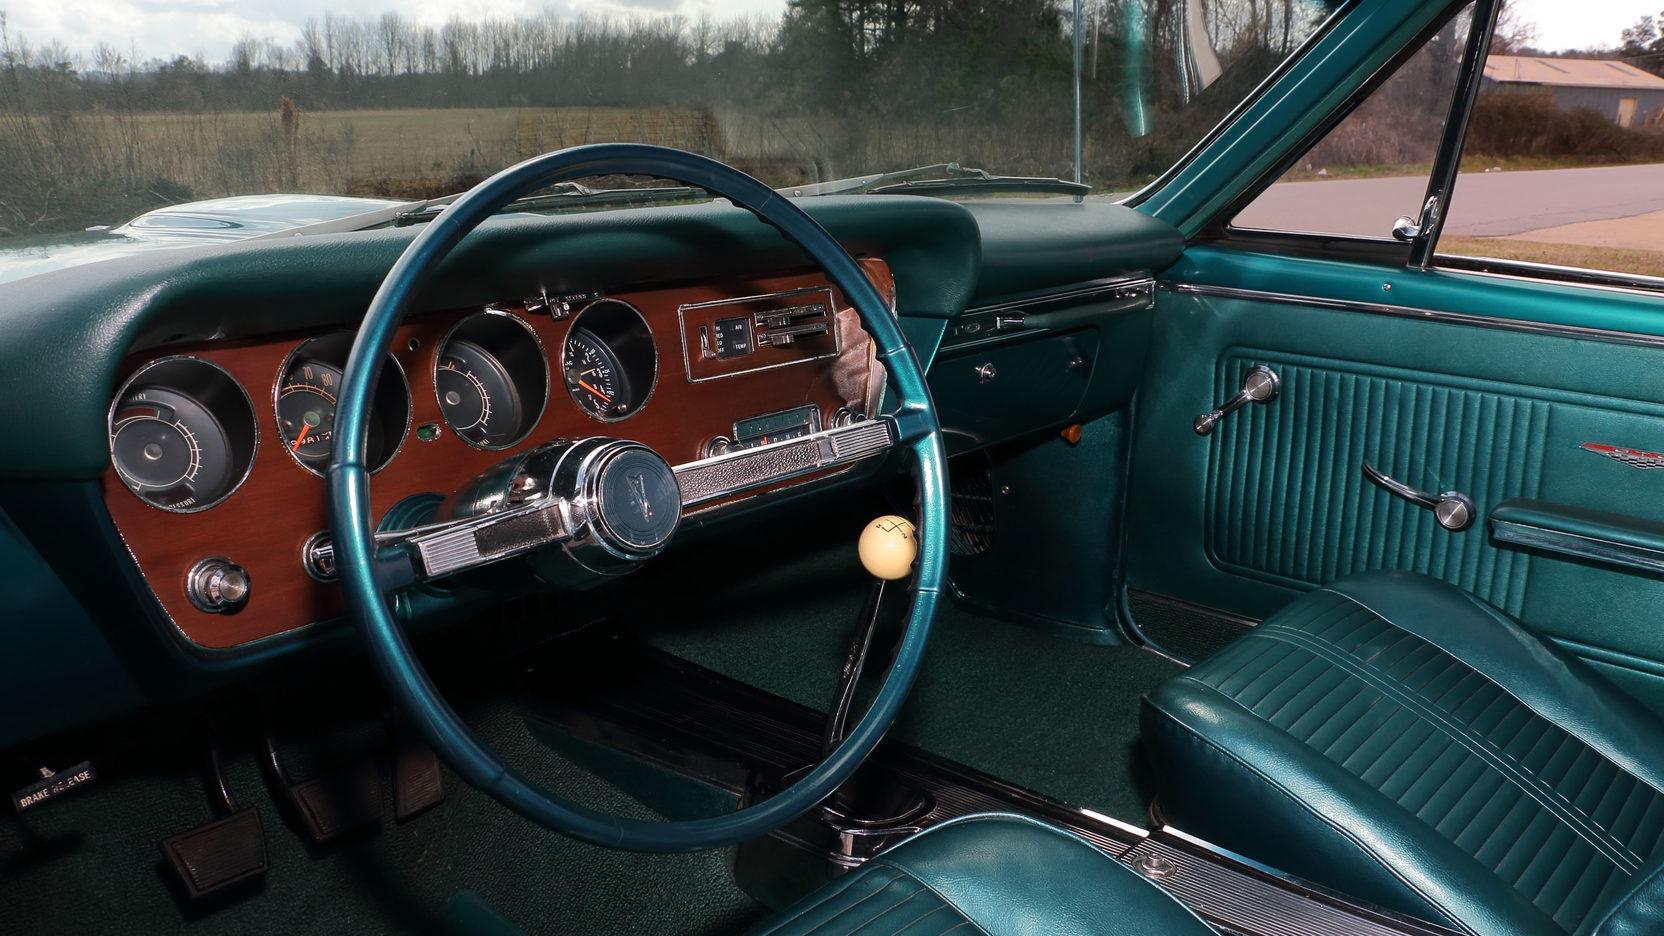 1966 Pontiac GTO interior